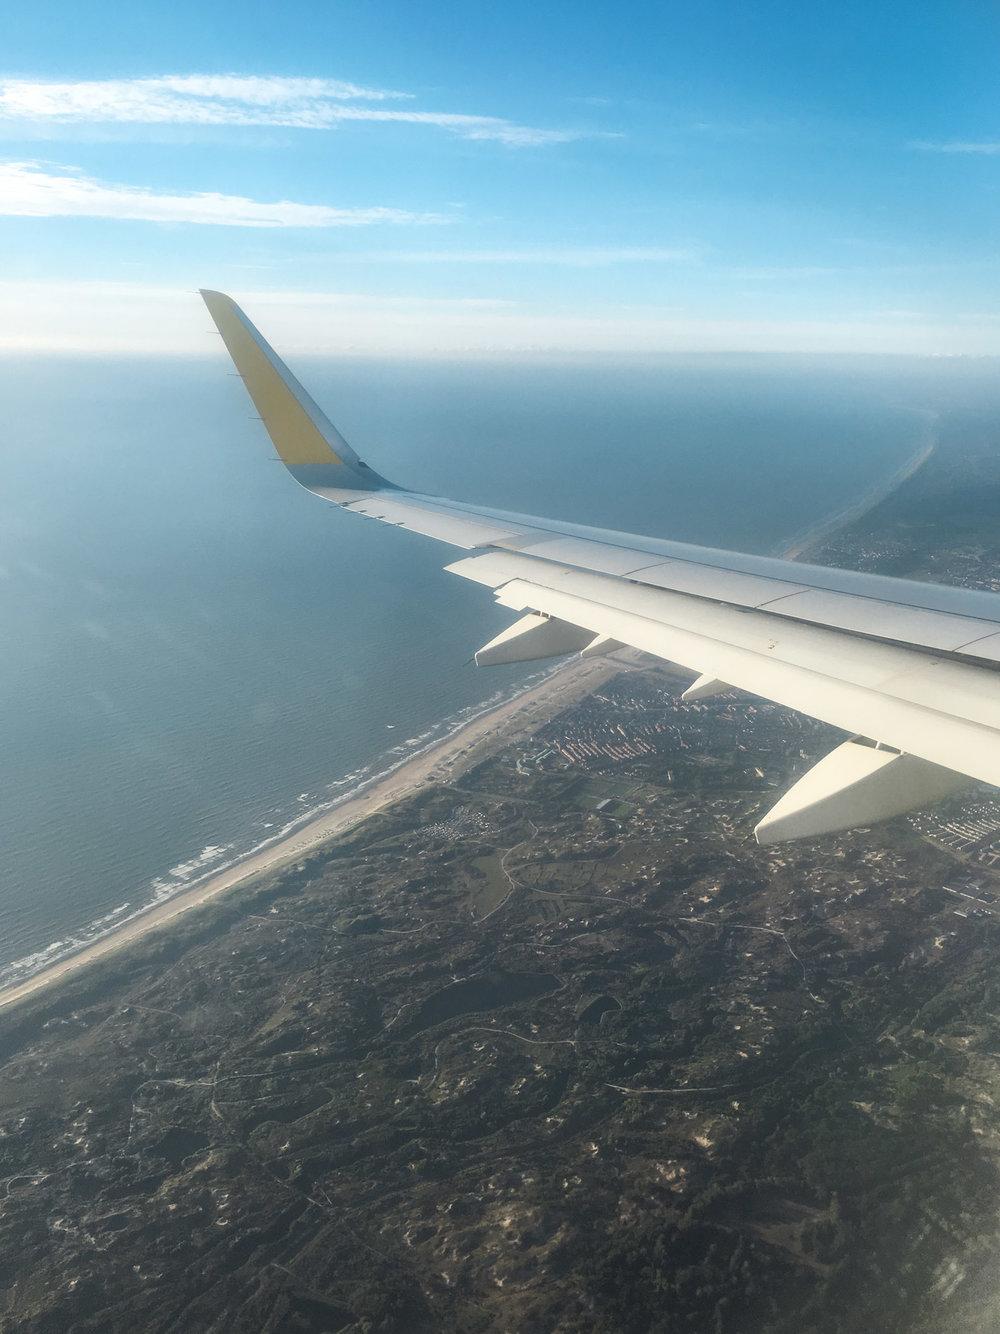 curio.trips.amsterdam.plane.iphone.jpg